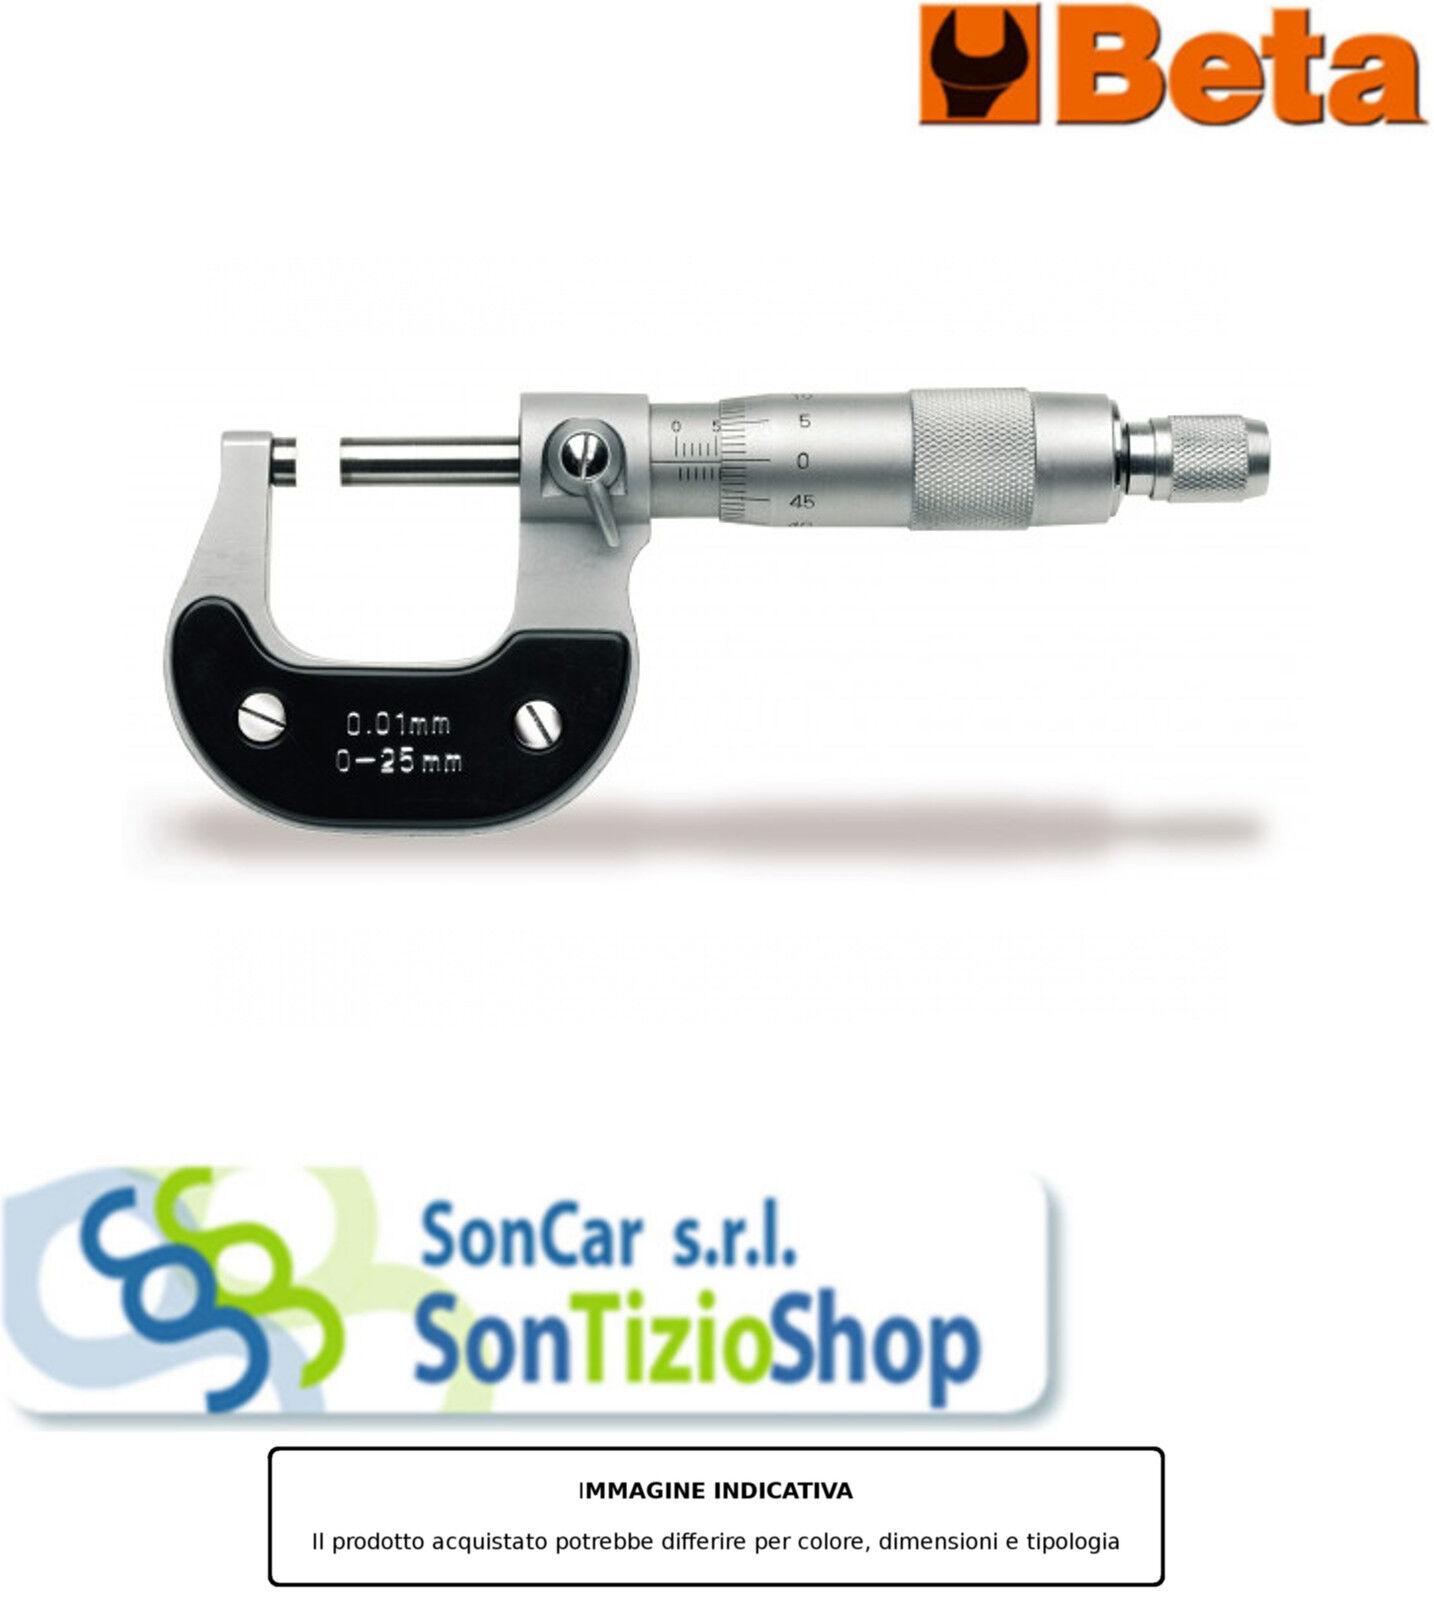 BETA 1658 /25 Artikel Original  Mikrometer Außen 1/100 /25